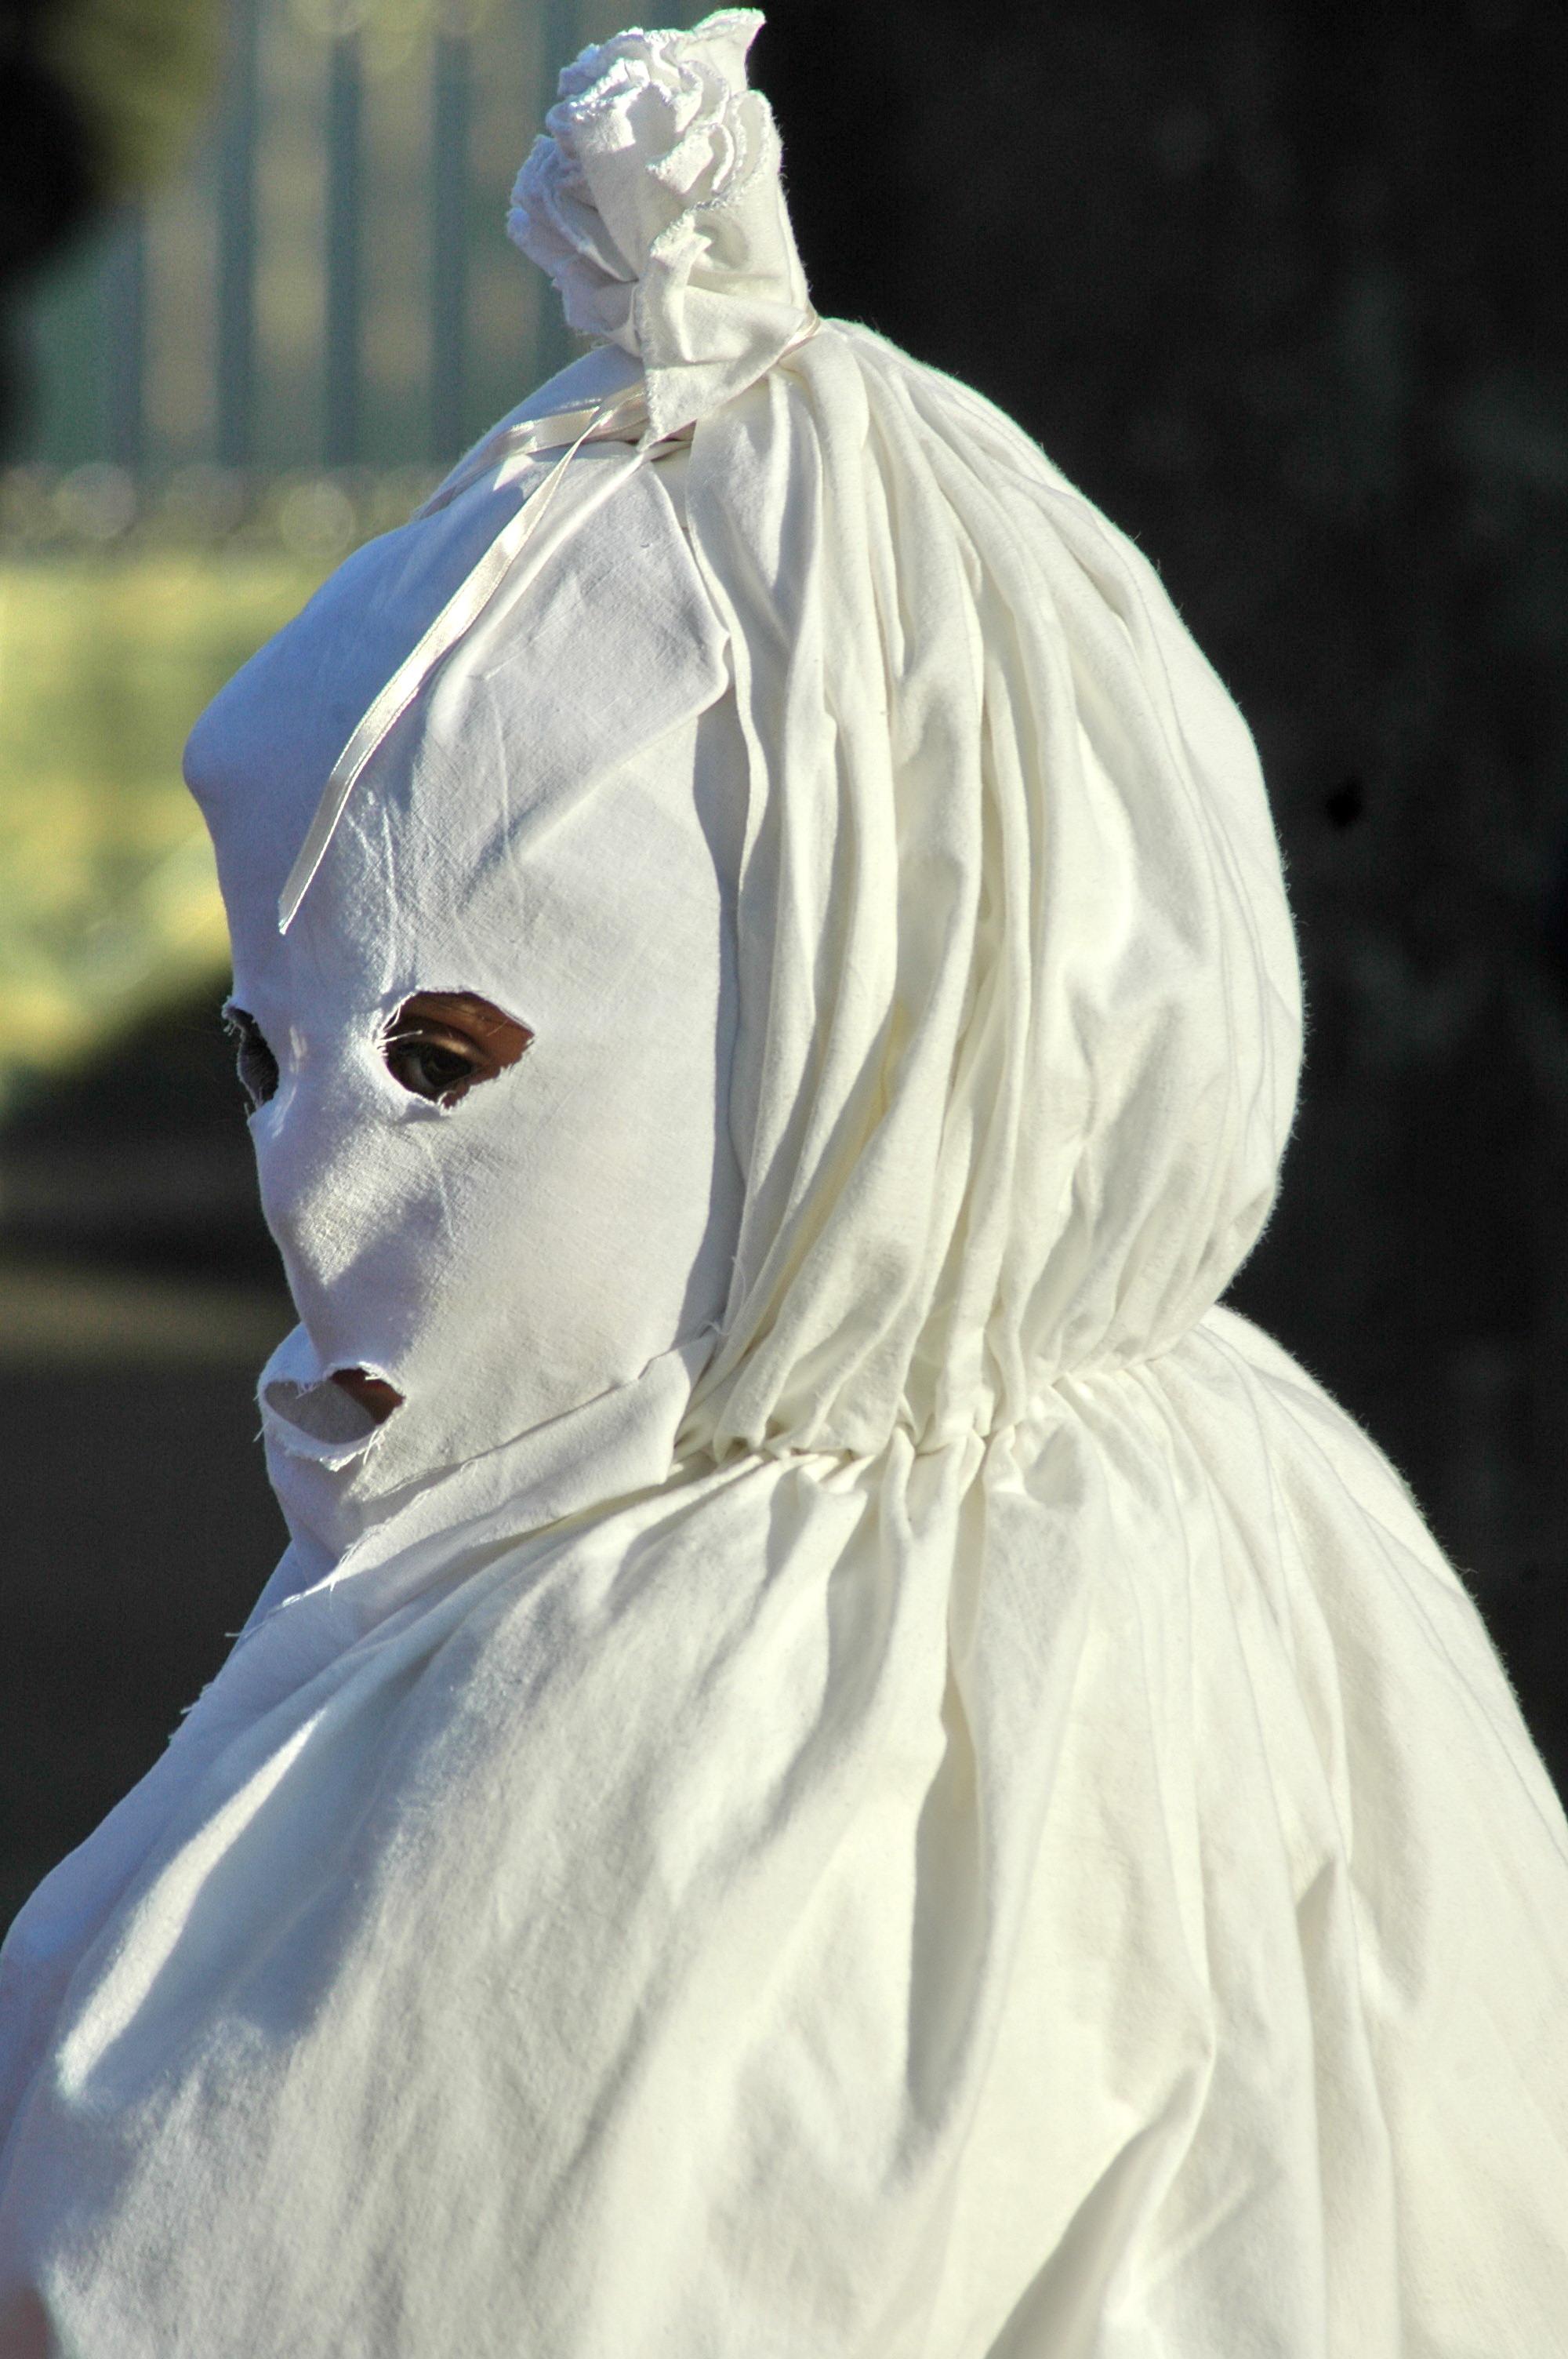 Maschera a Lenzolu - Cristiano Cani